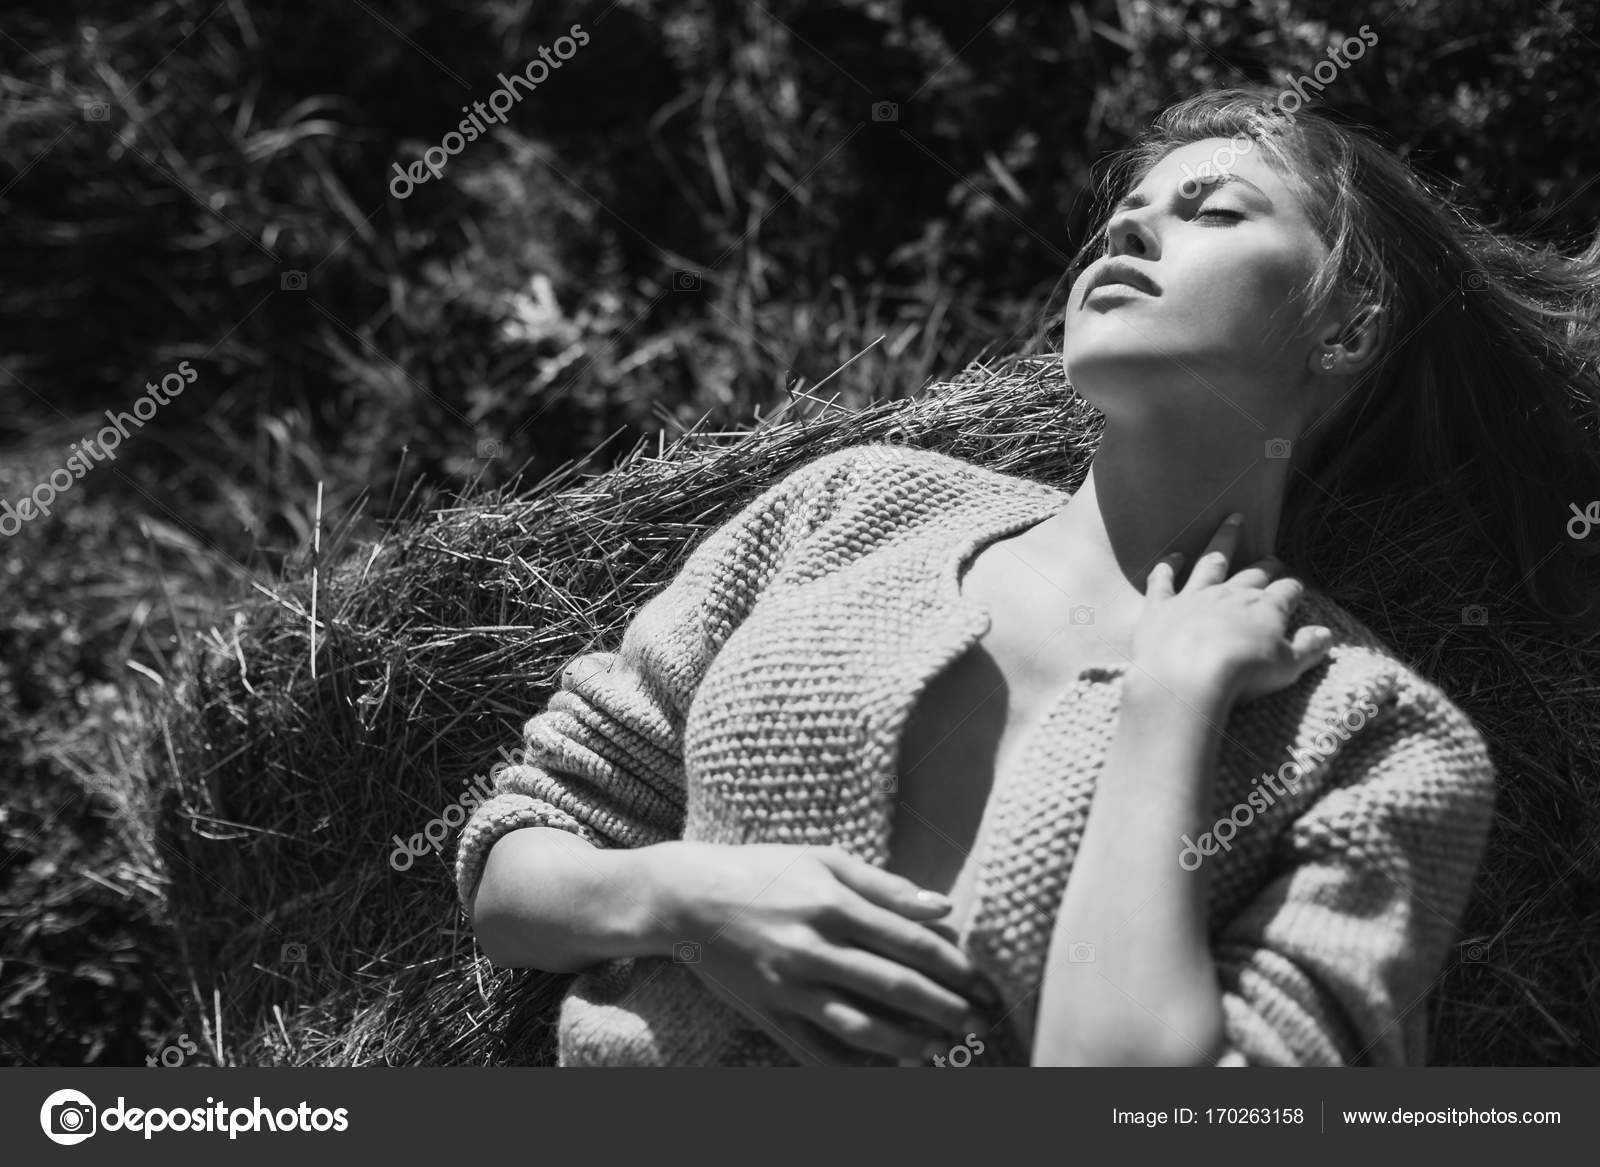 Фото голая девушка на сене крупный план — img 15